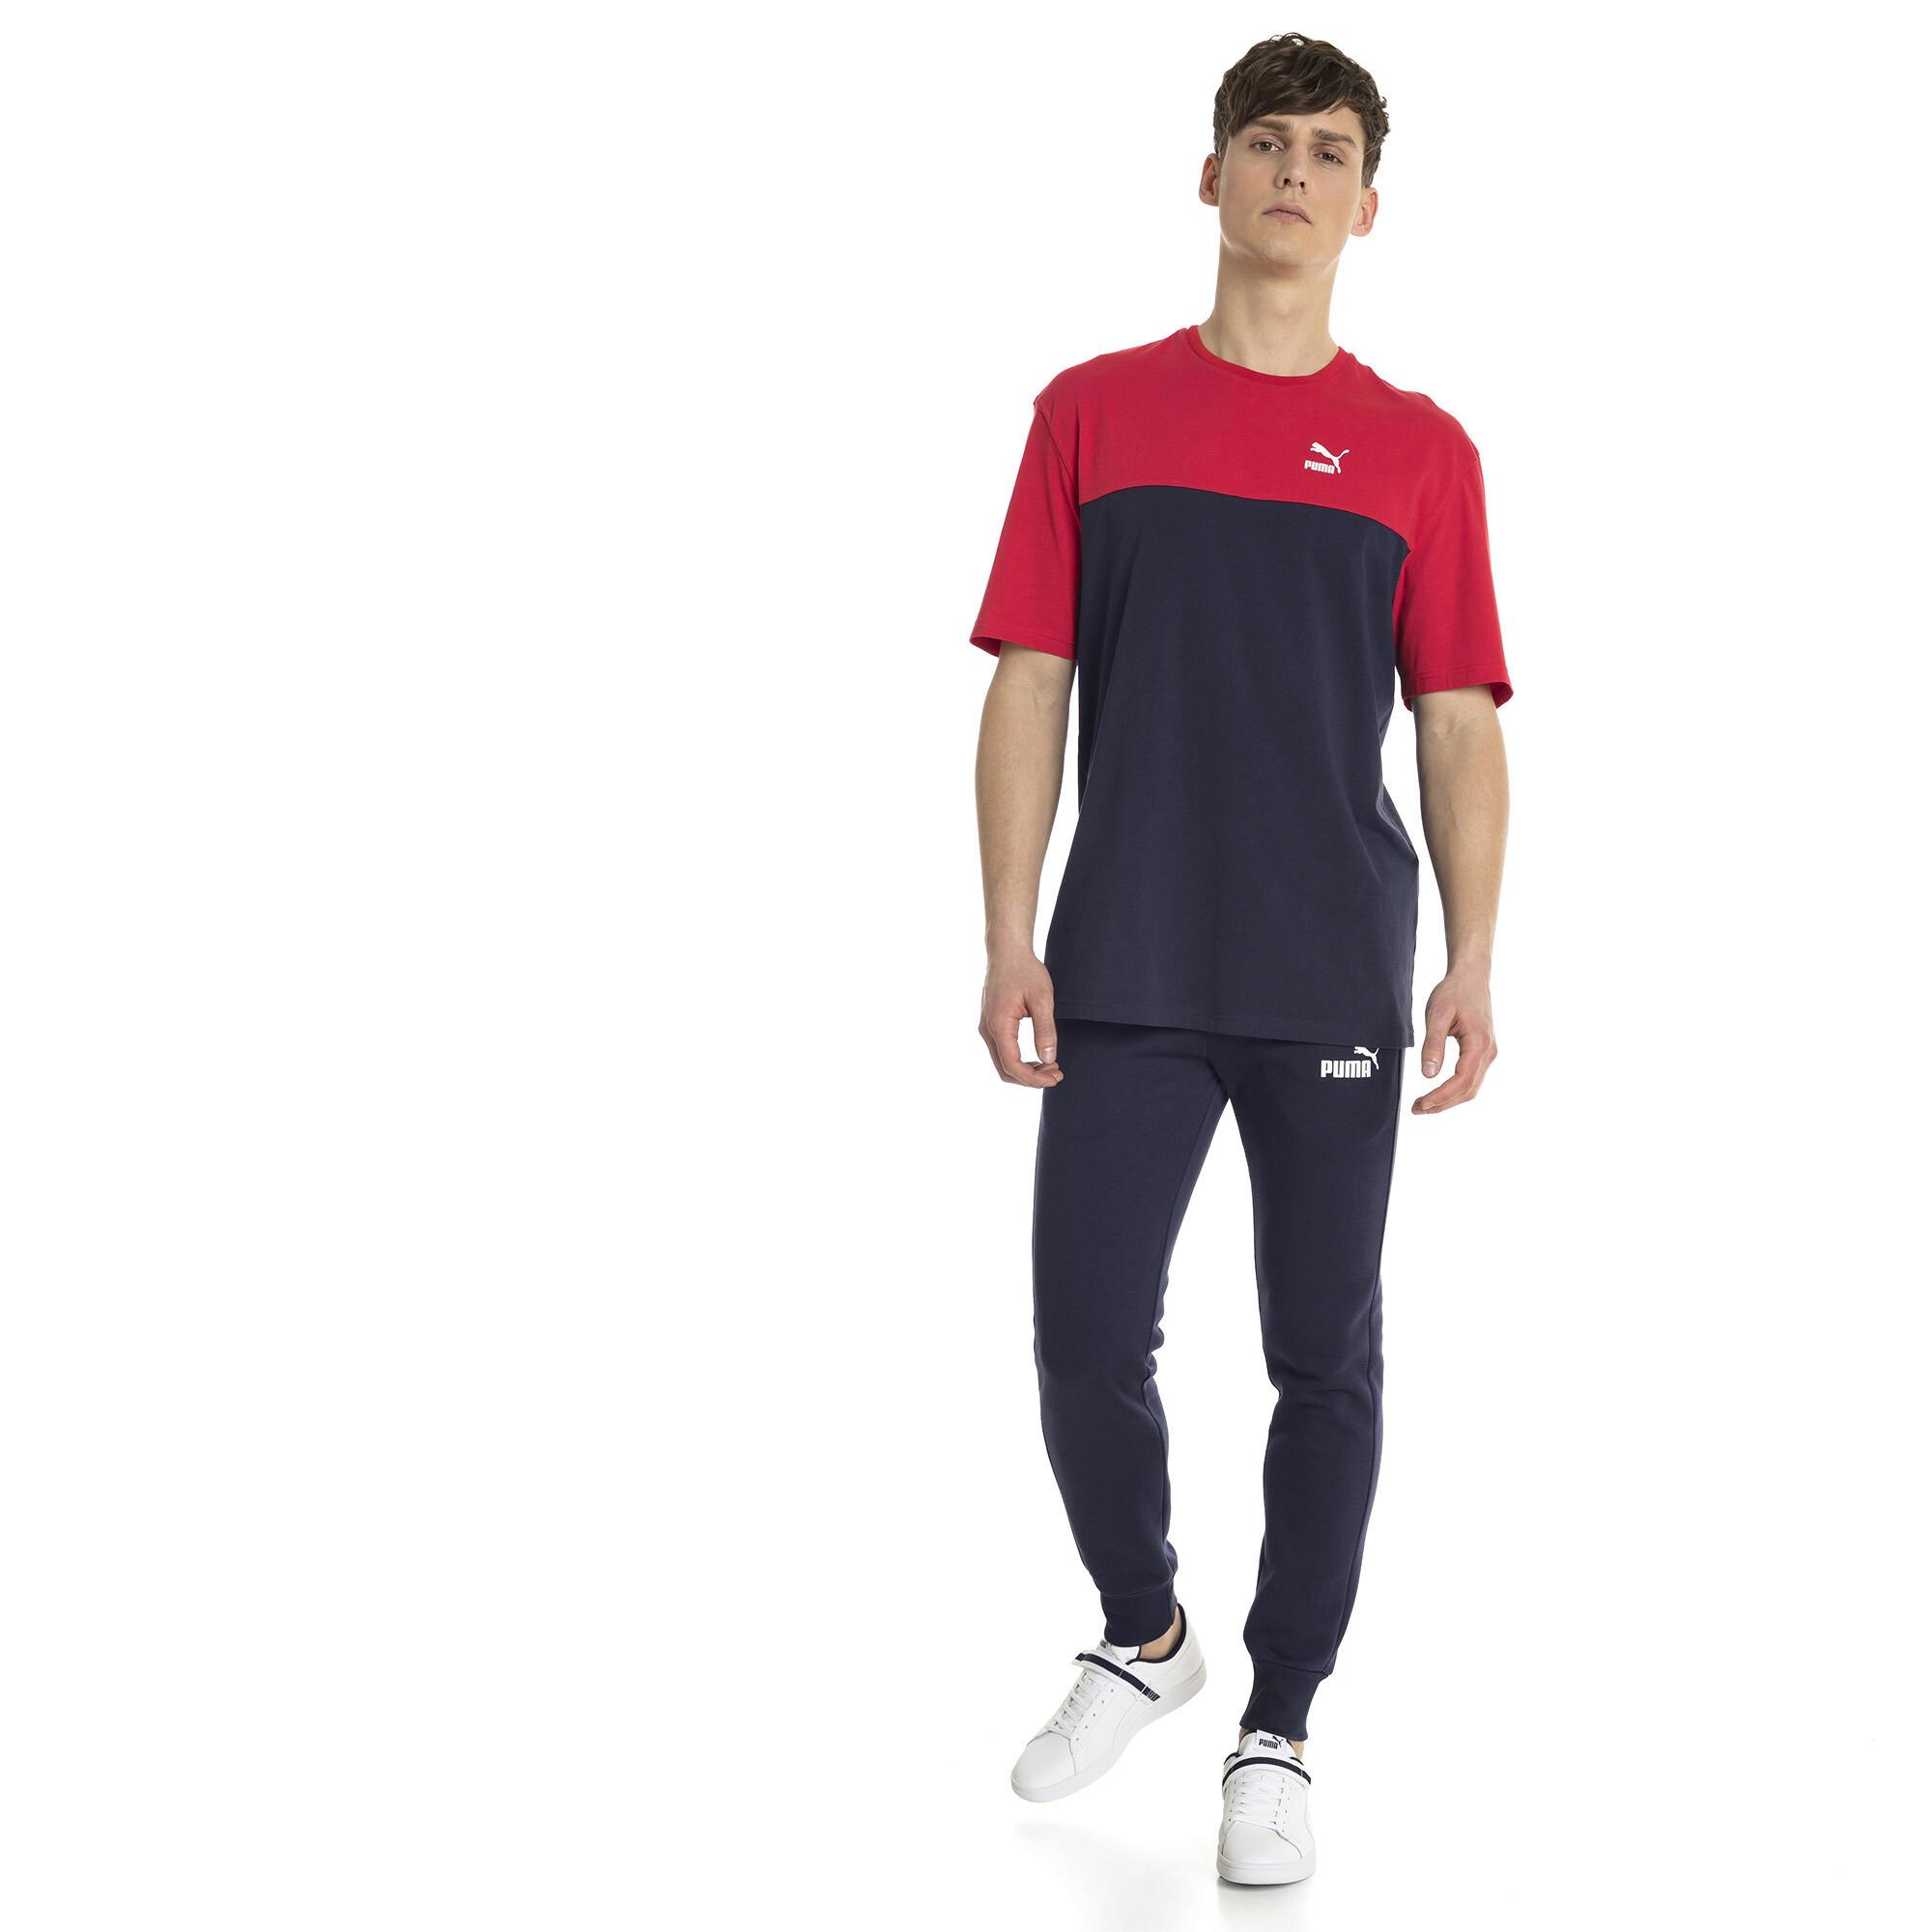 PUMA-Essentials-Men-039-s-Fleece-Knit-Pants-Men-Knitted-Pants-Basics thumbnail 8